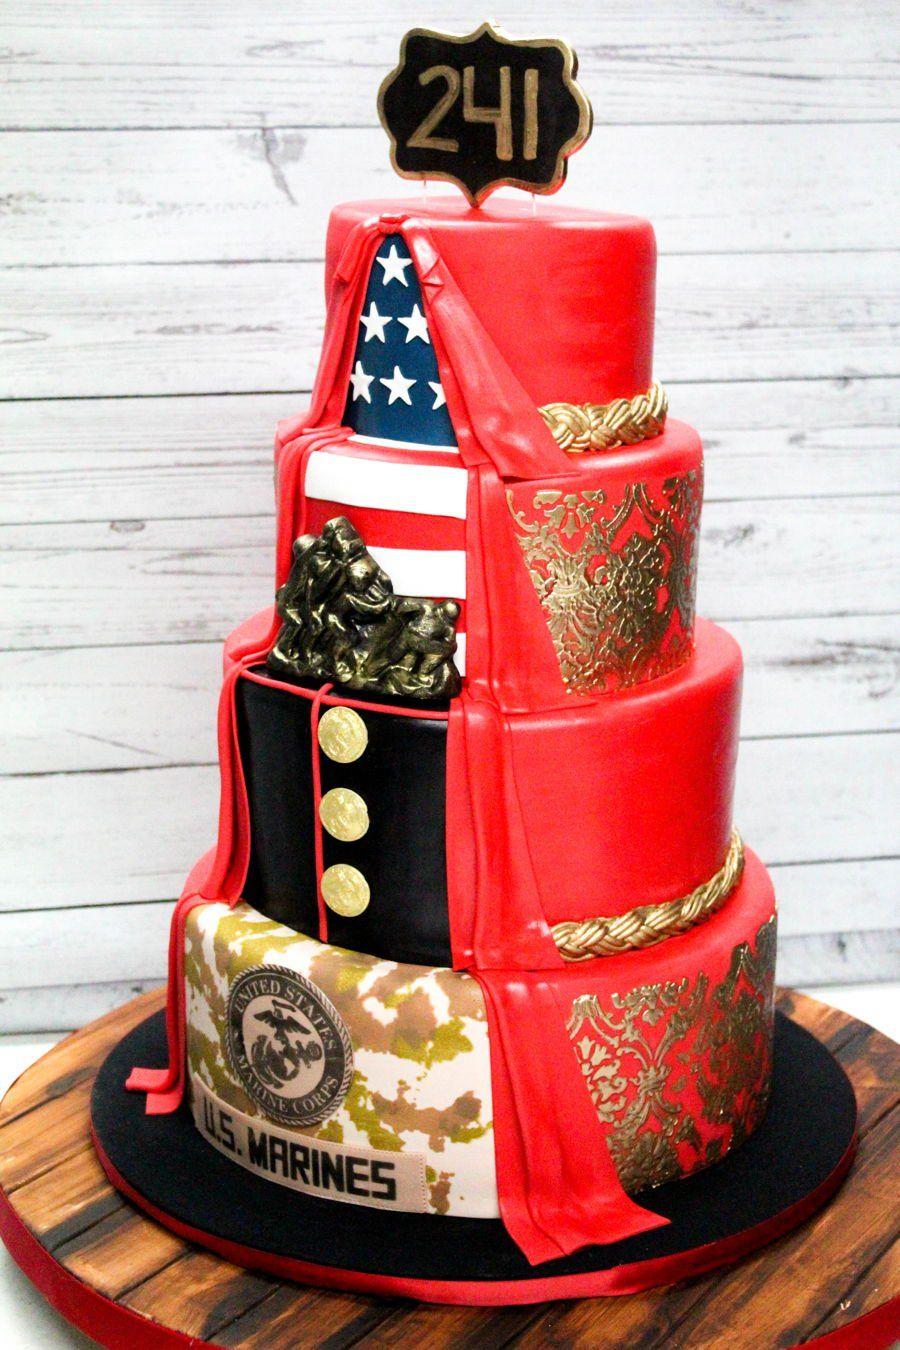 Usmc Birthday Cake 2 sided USMC fondant cake. 4 tier